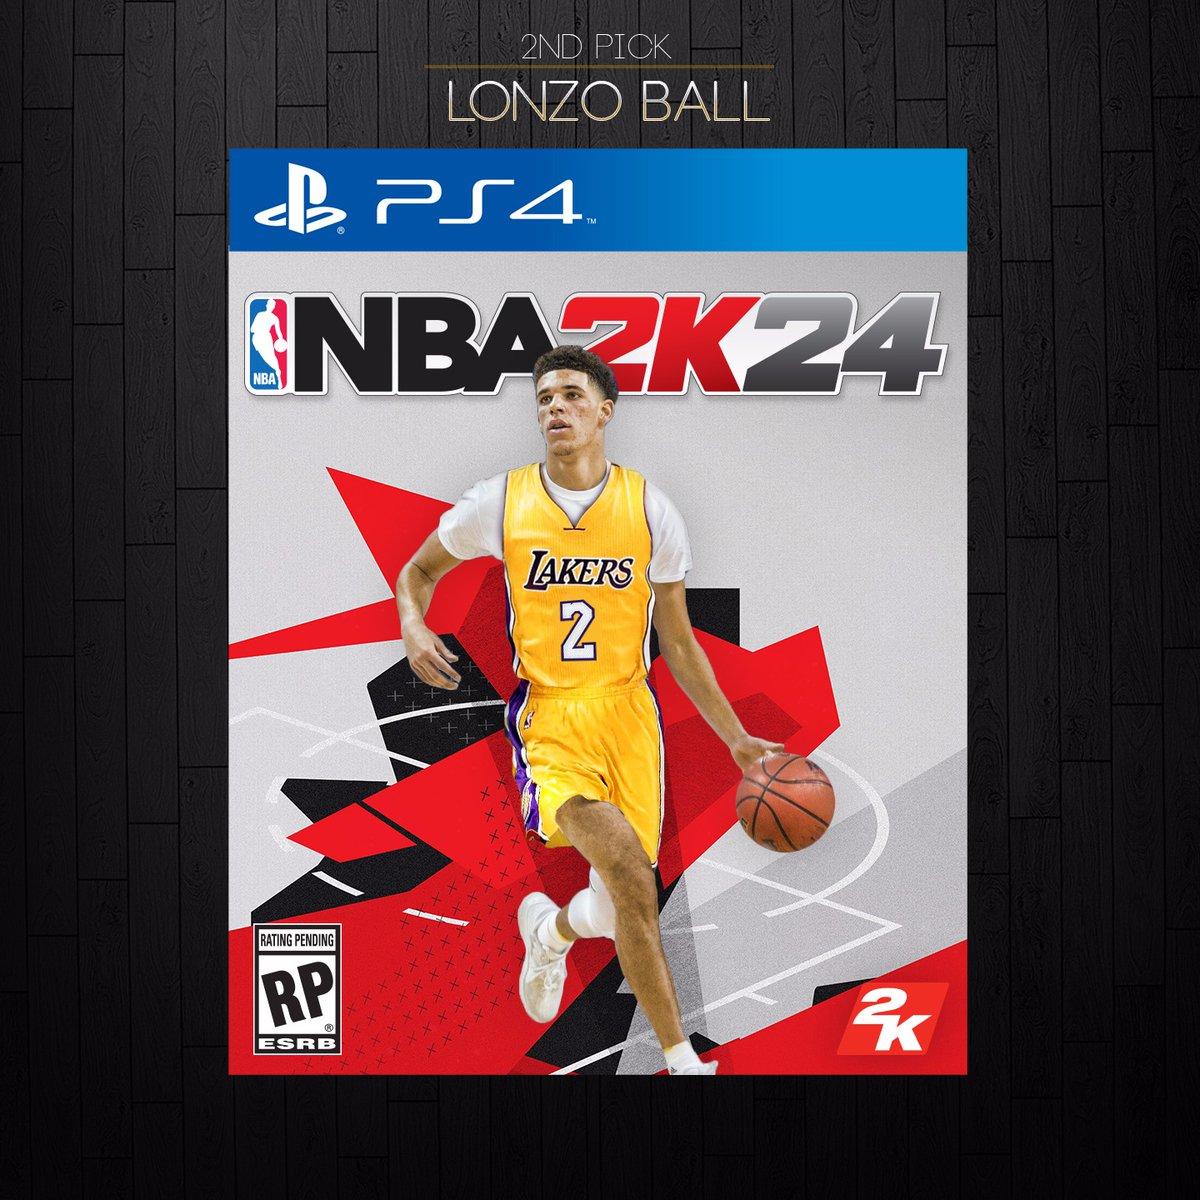 NBA 2K17 News: The NBA Draft And 2017 Offseason Roster - u4nba com